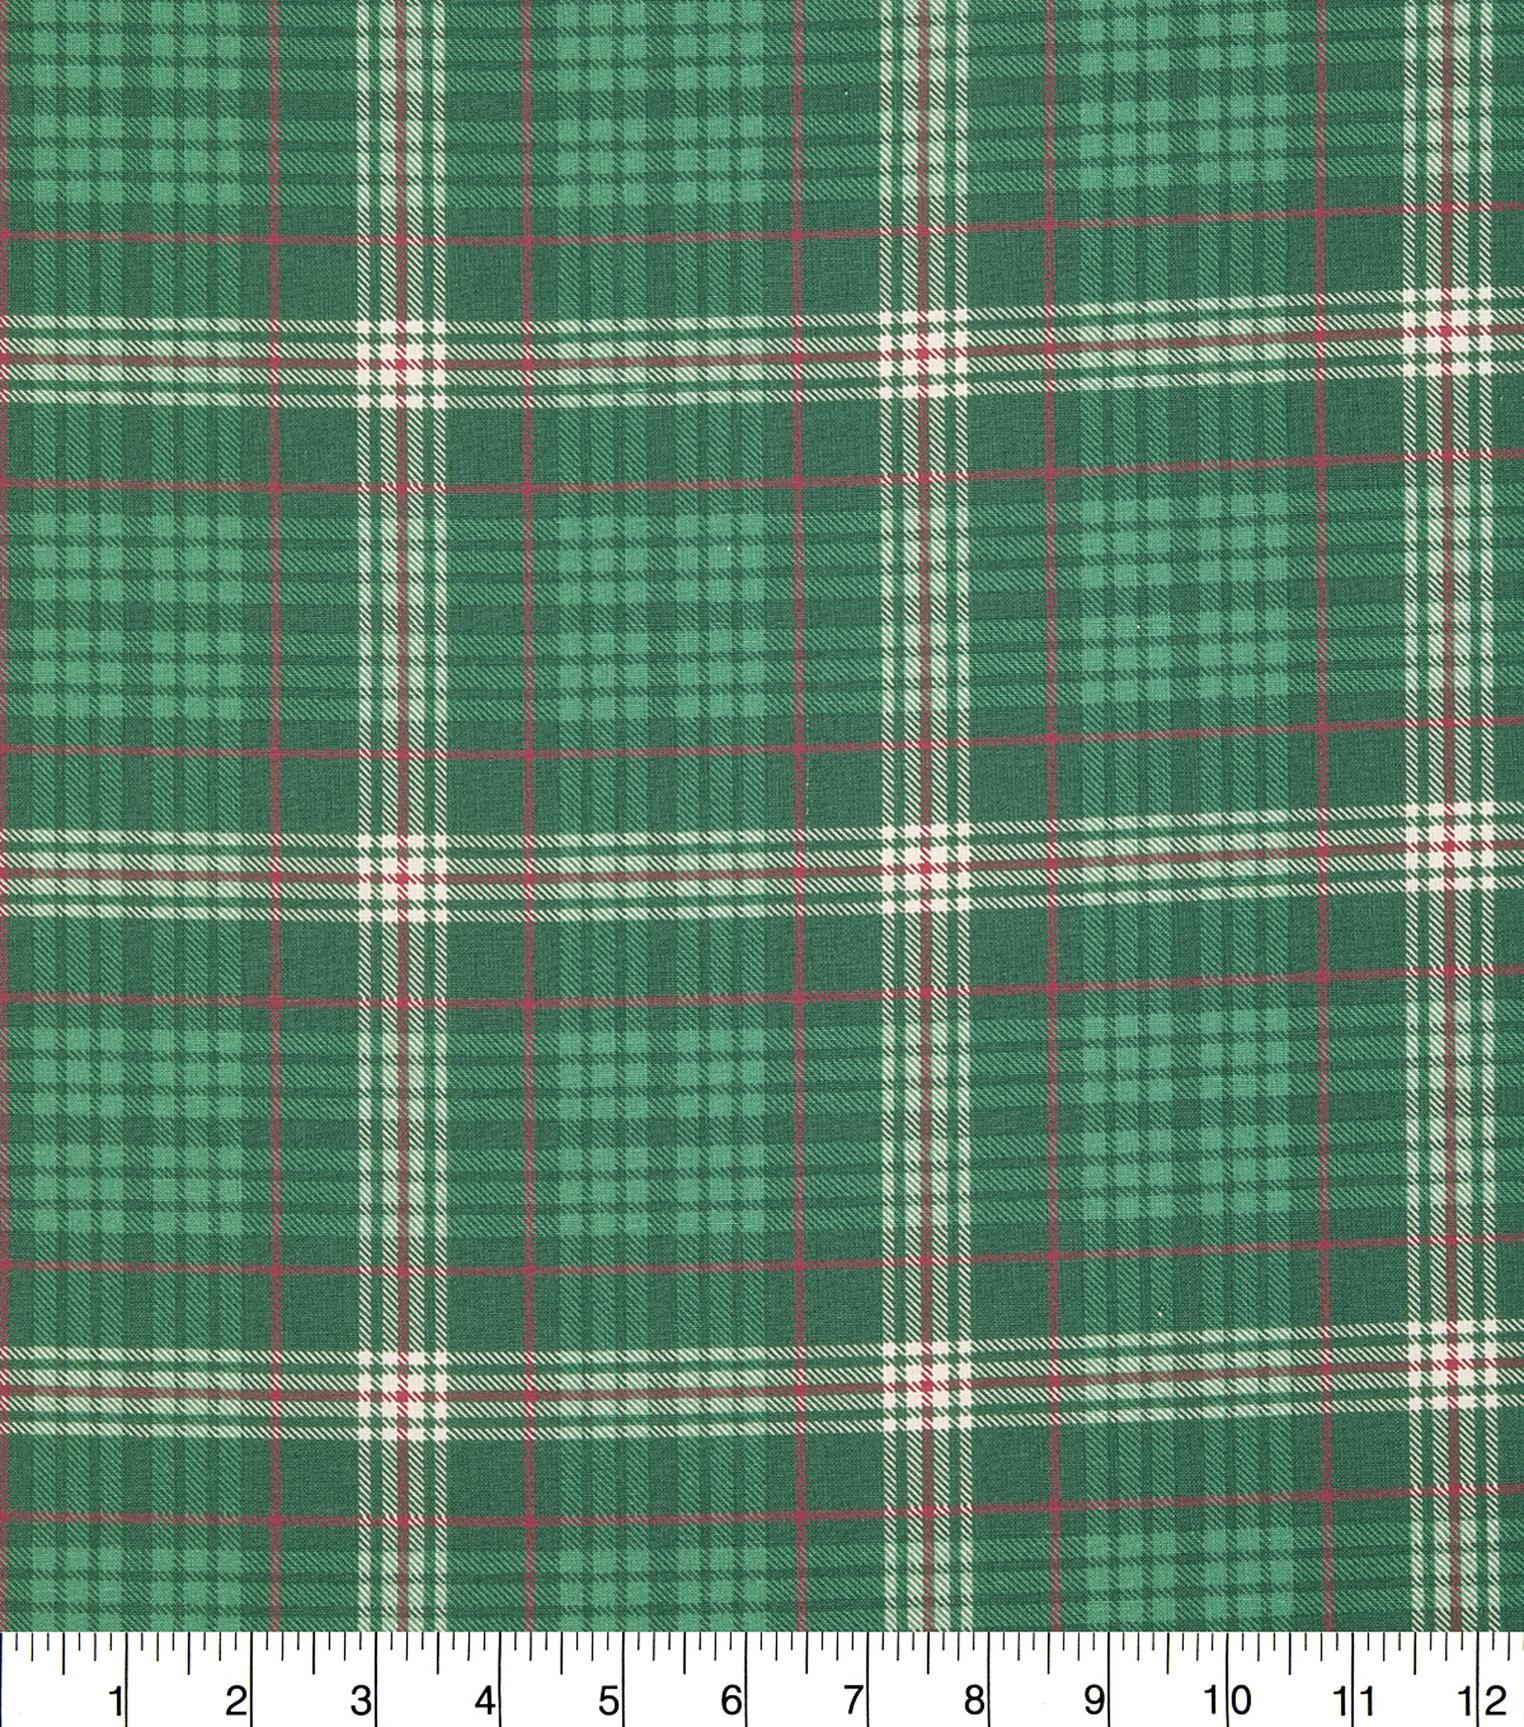 christmas cotton fabric 43u0022 green lodge plaid - Christmas Plaid Fabric